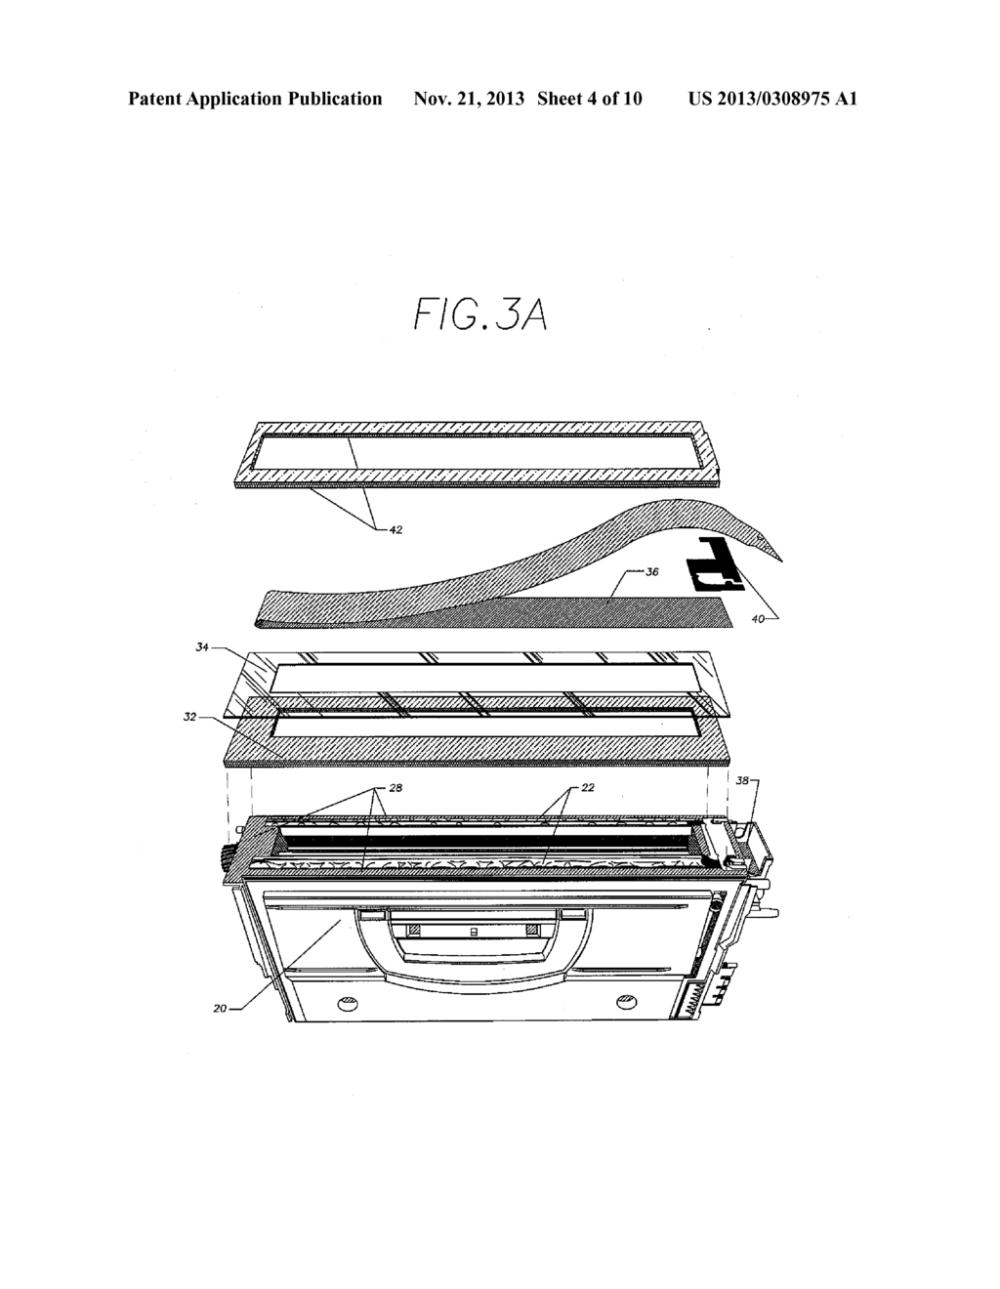 medium resolution of laser printer toner cartridge seal and method diagram schematic and image 05